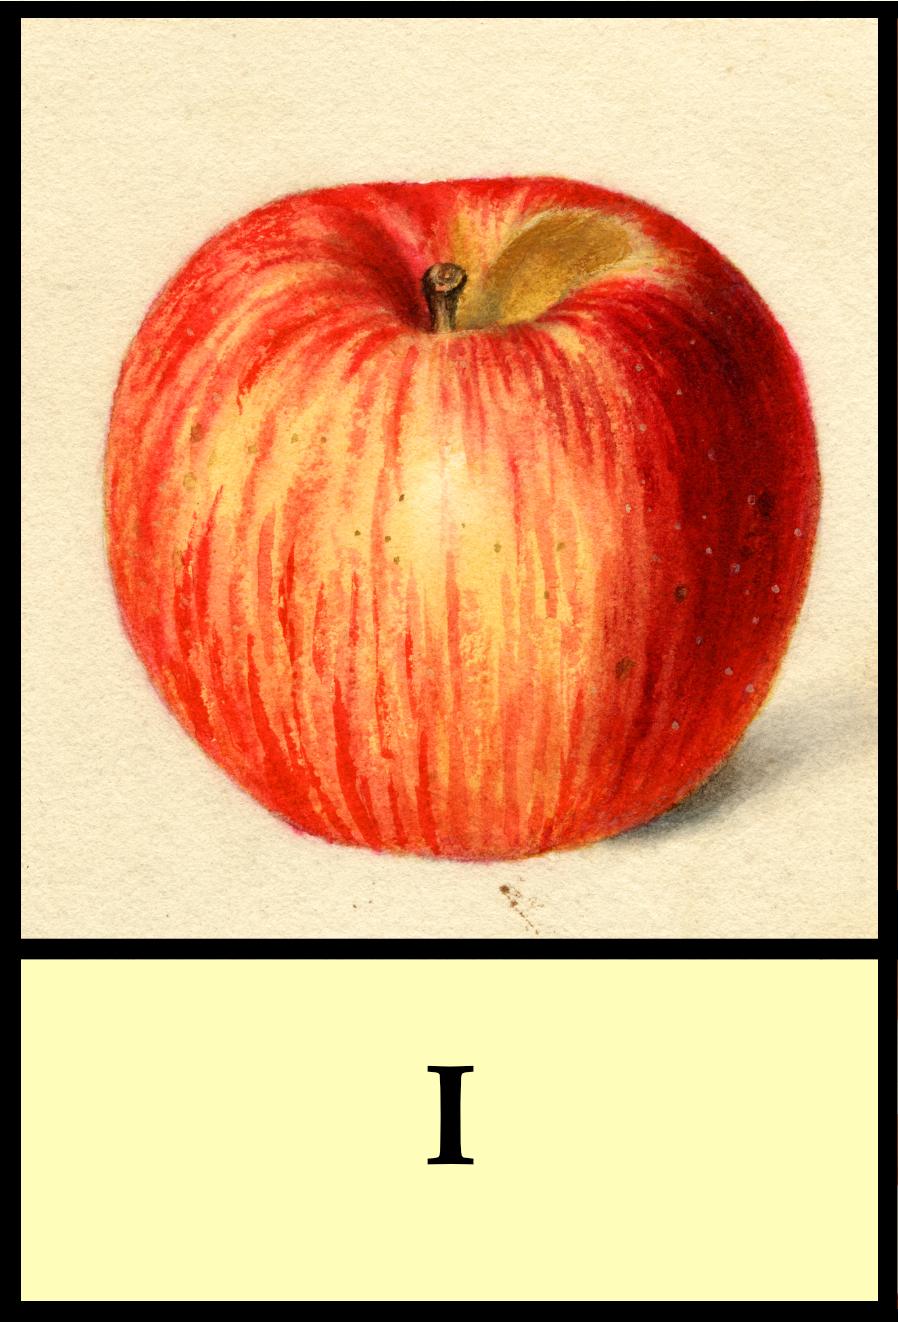 I apples